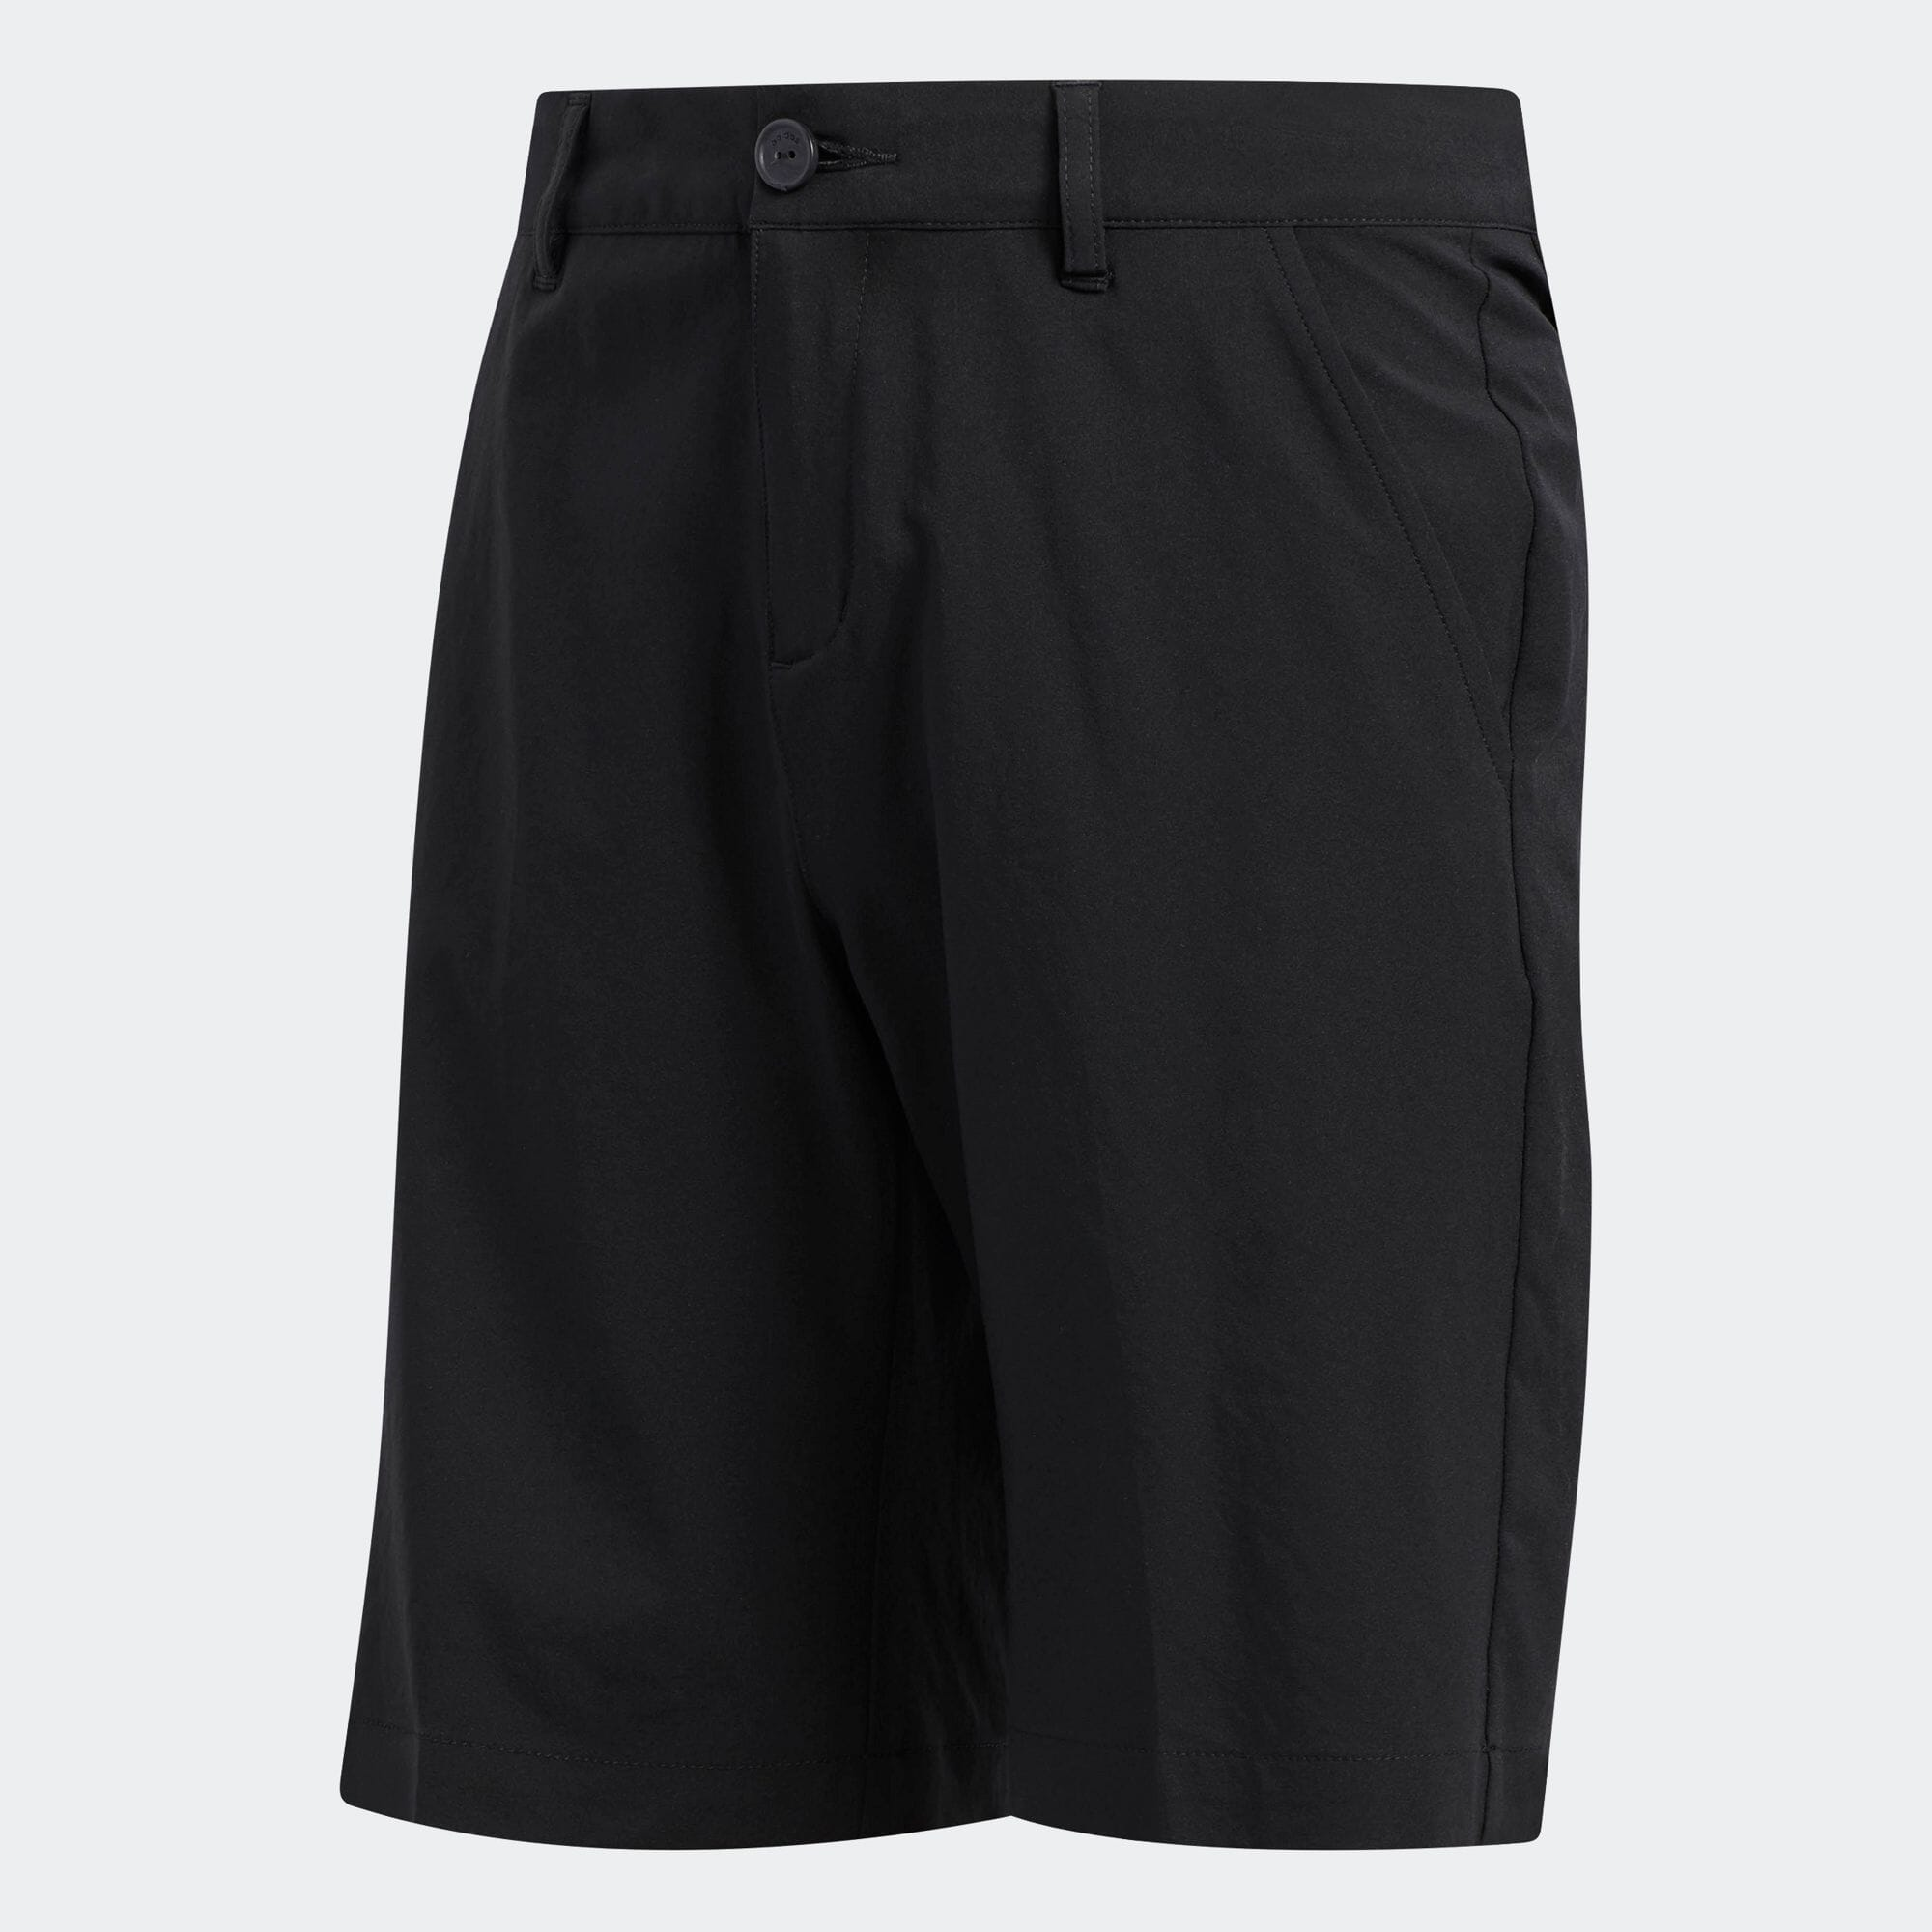 BOYS ショートパンツ【ゴルフ】